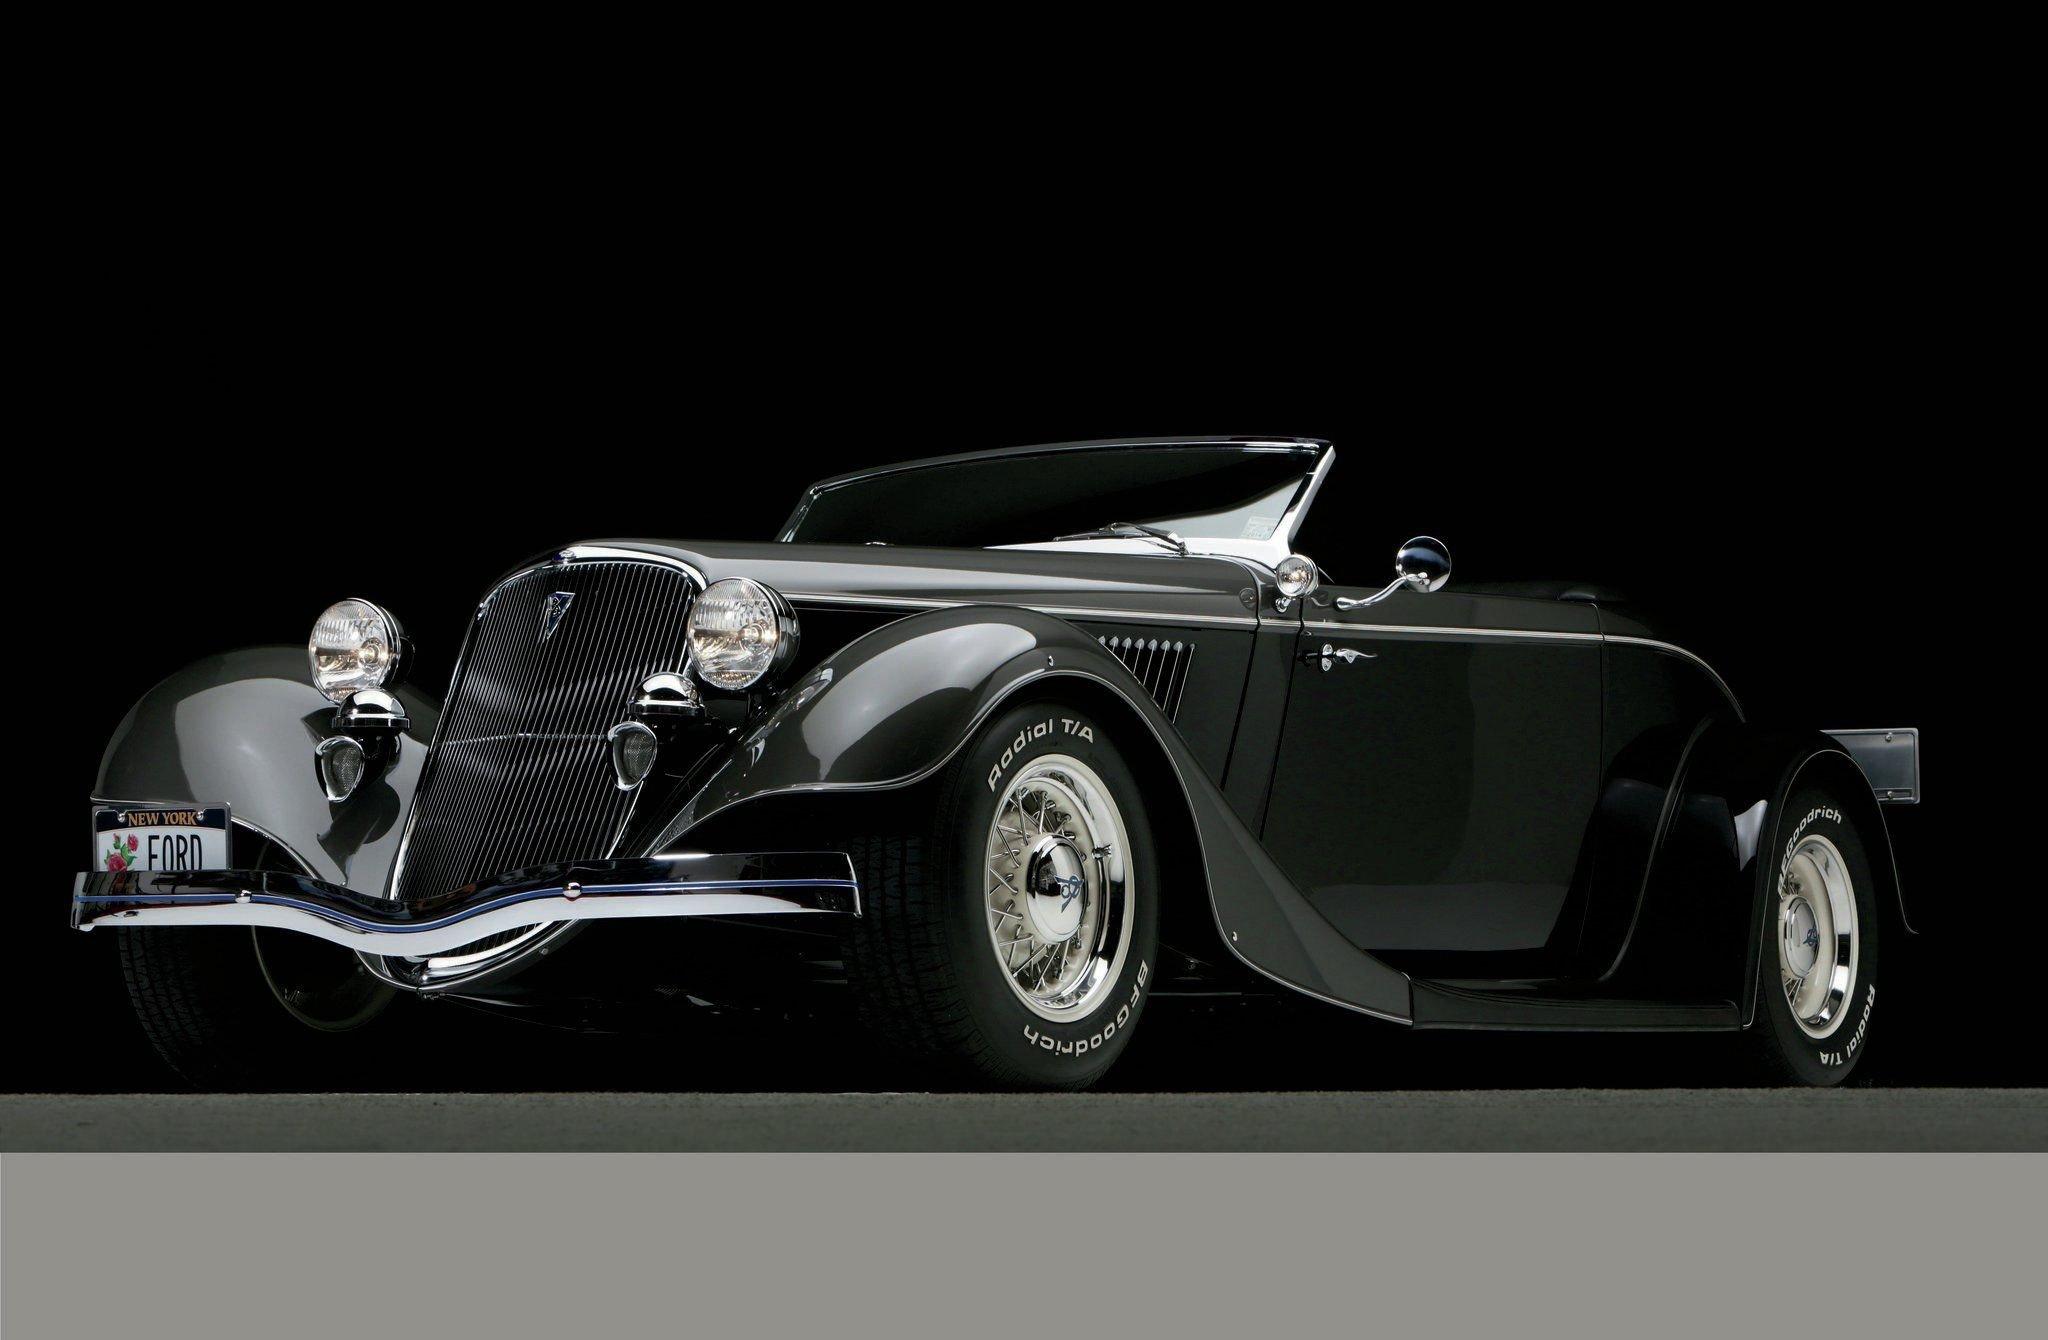 1933 Factory Five Racing Convertible-01 wallpaper